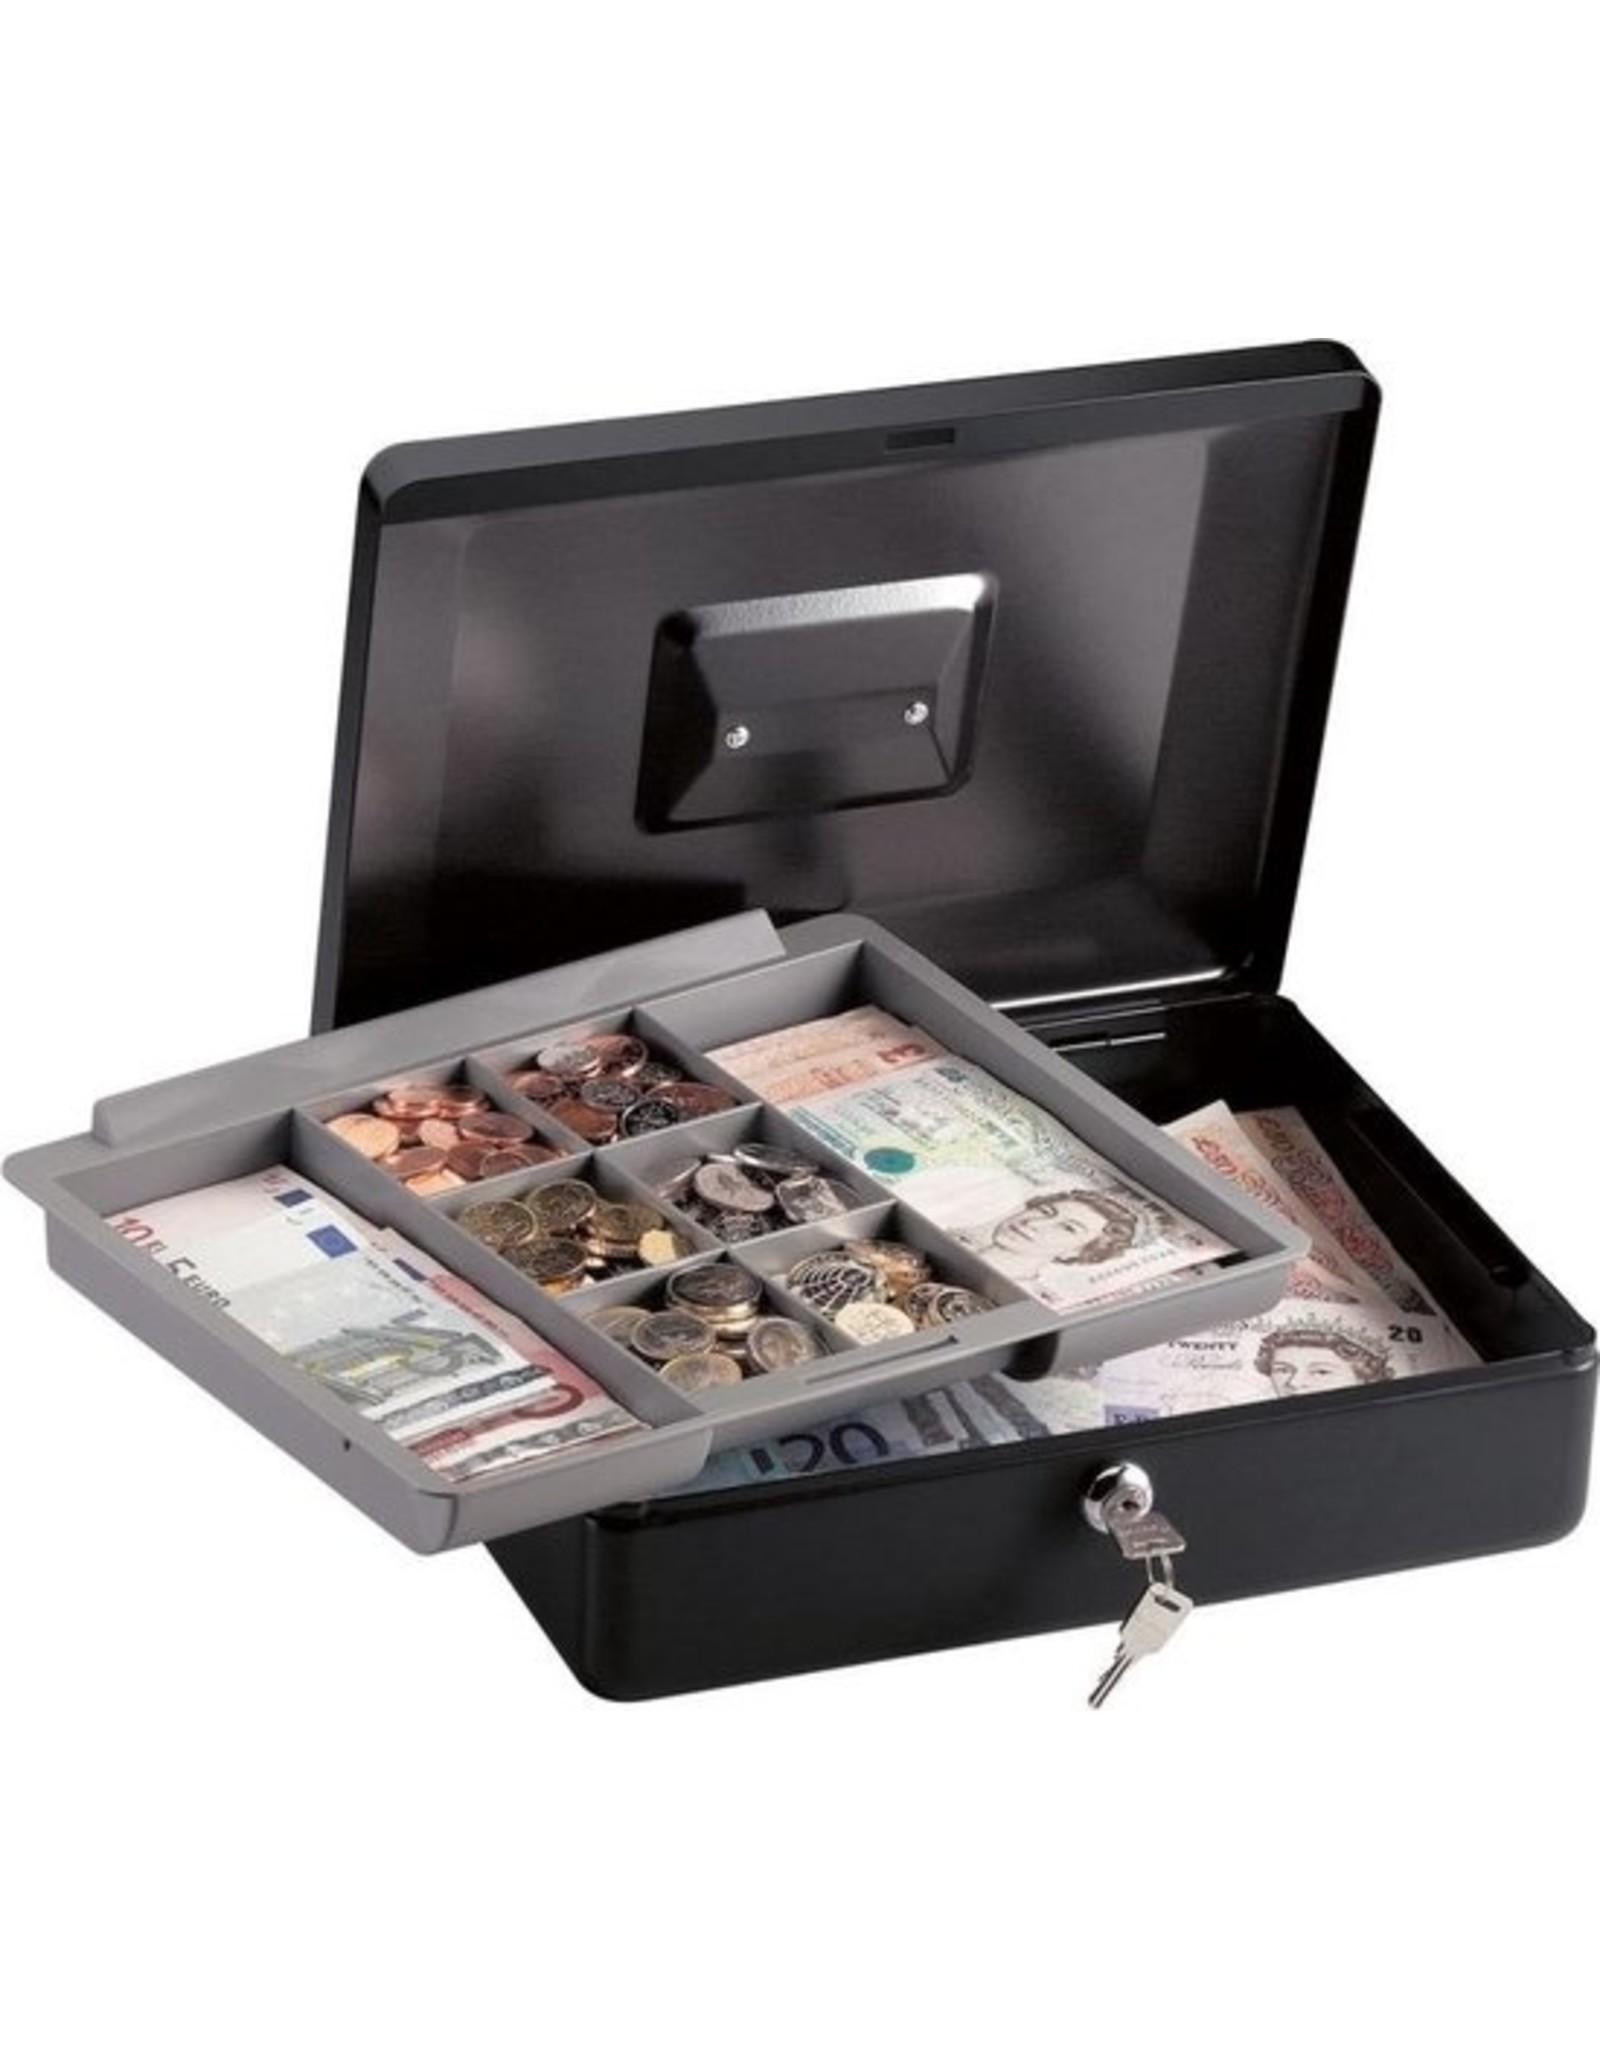 MasterLock Masterlock kluis geldkist met tray en handvat, CB-12ML